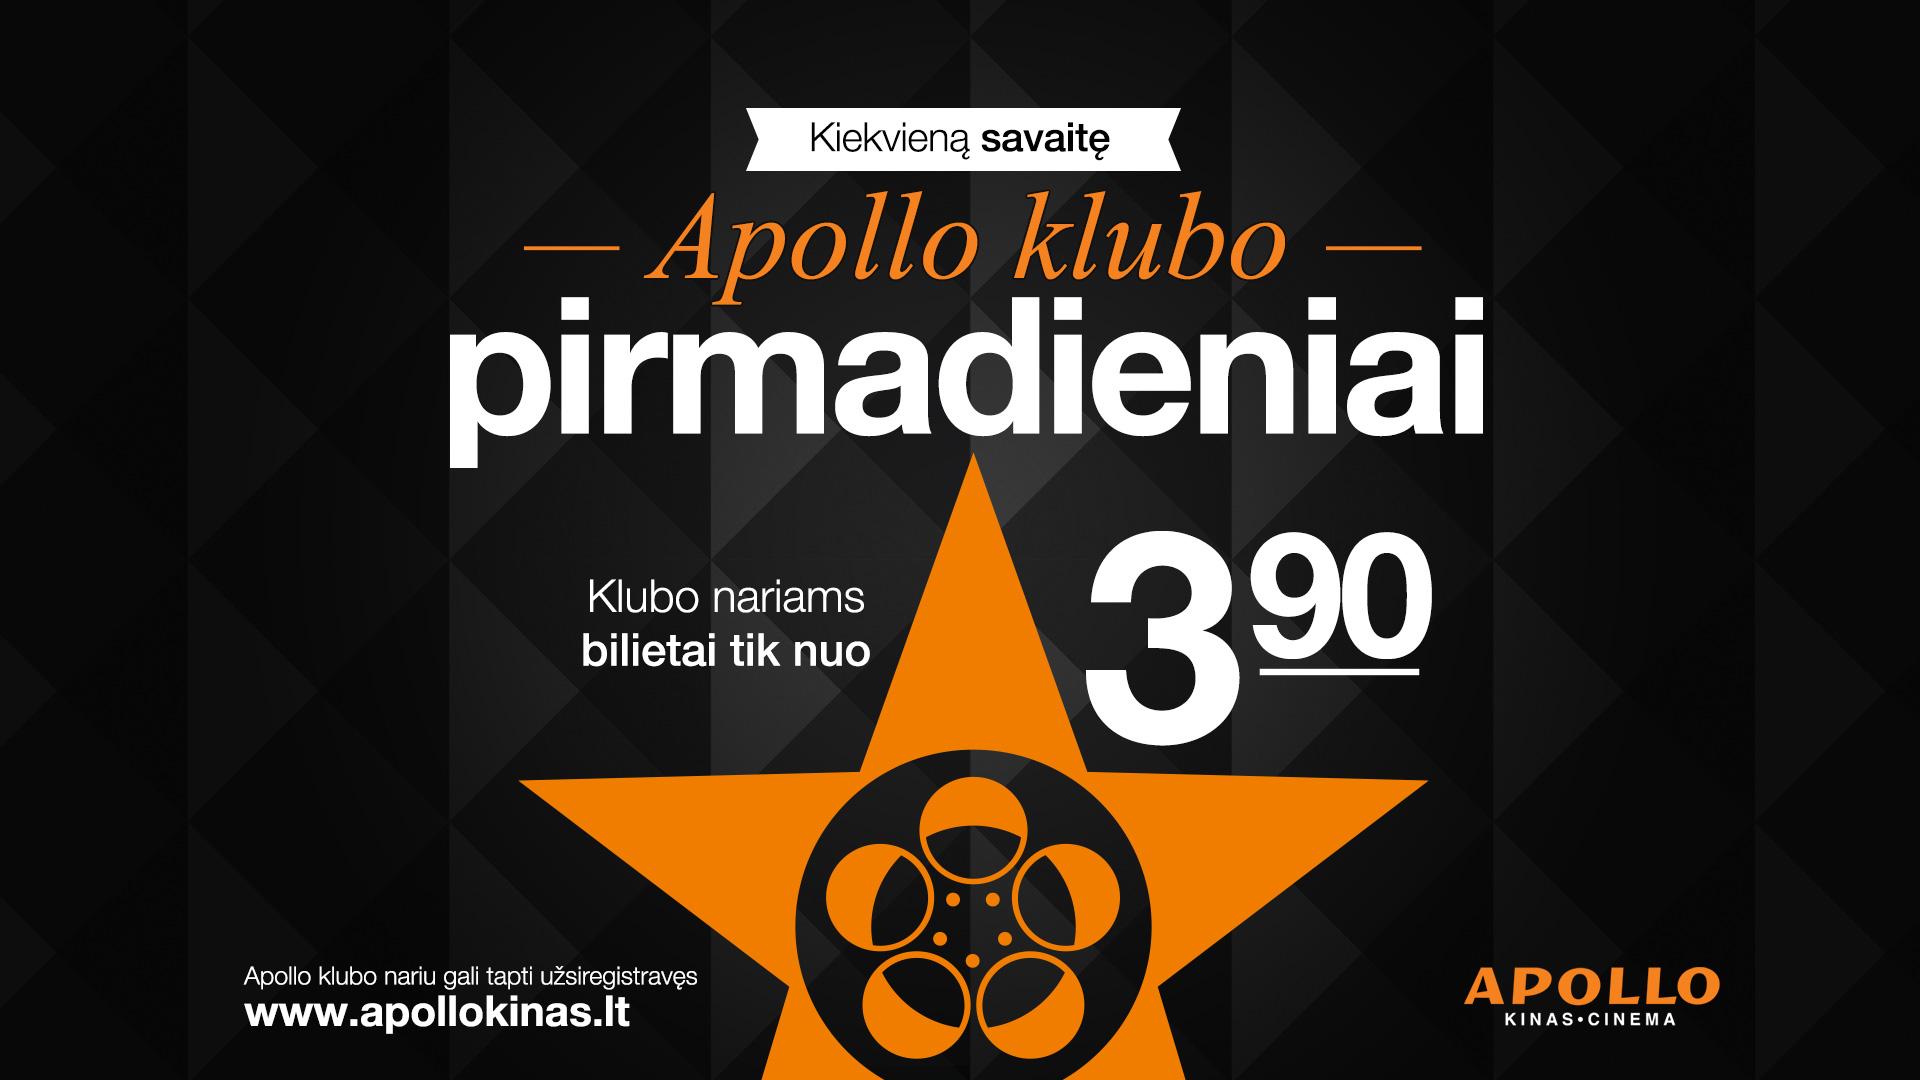 Apollo klubo pirmadieniai